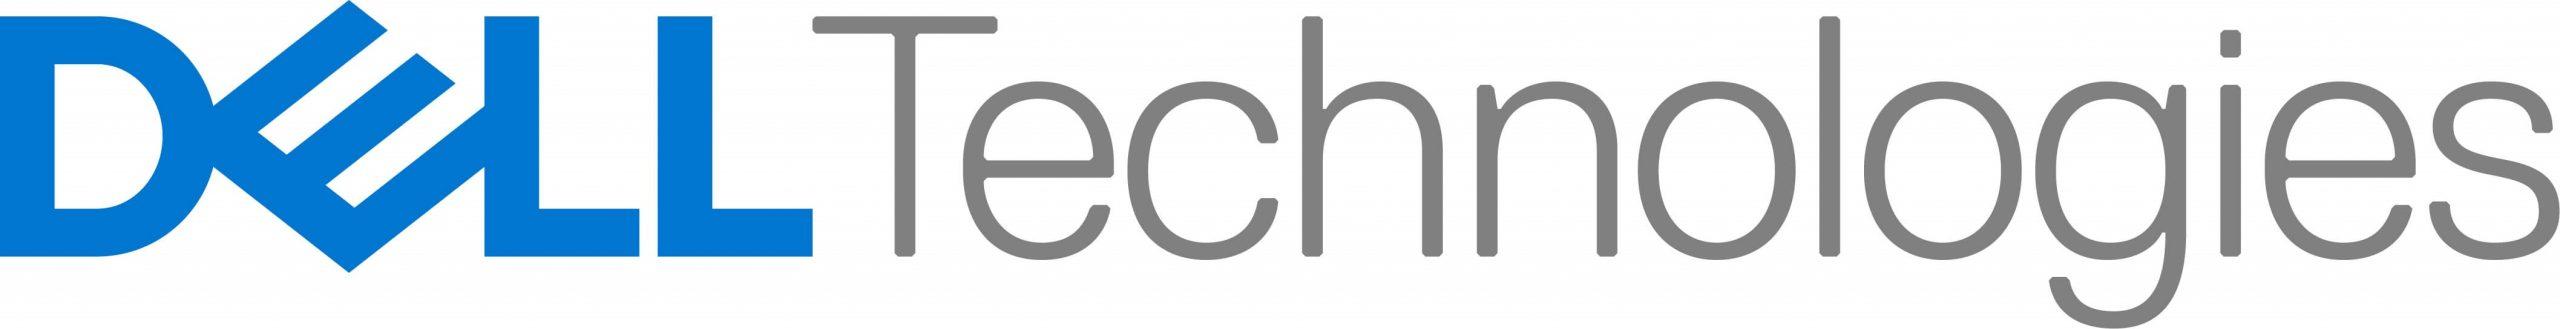 DellTech_Logo_Prm_Blue_Gry_rgb_kleiner